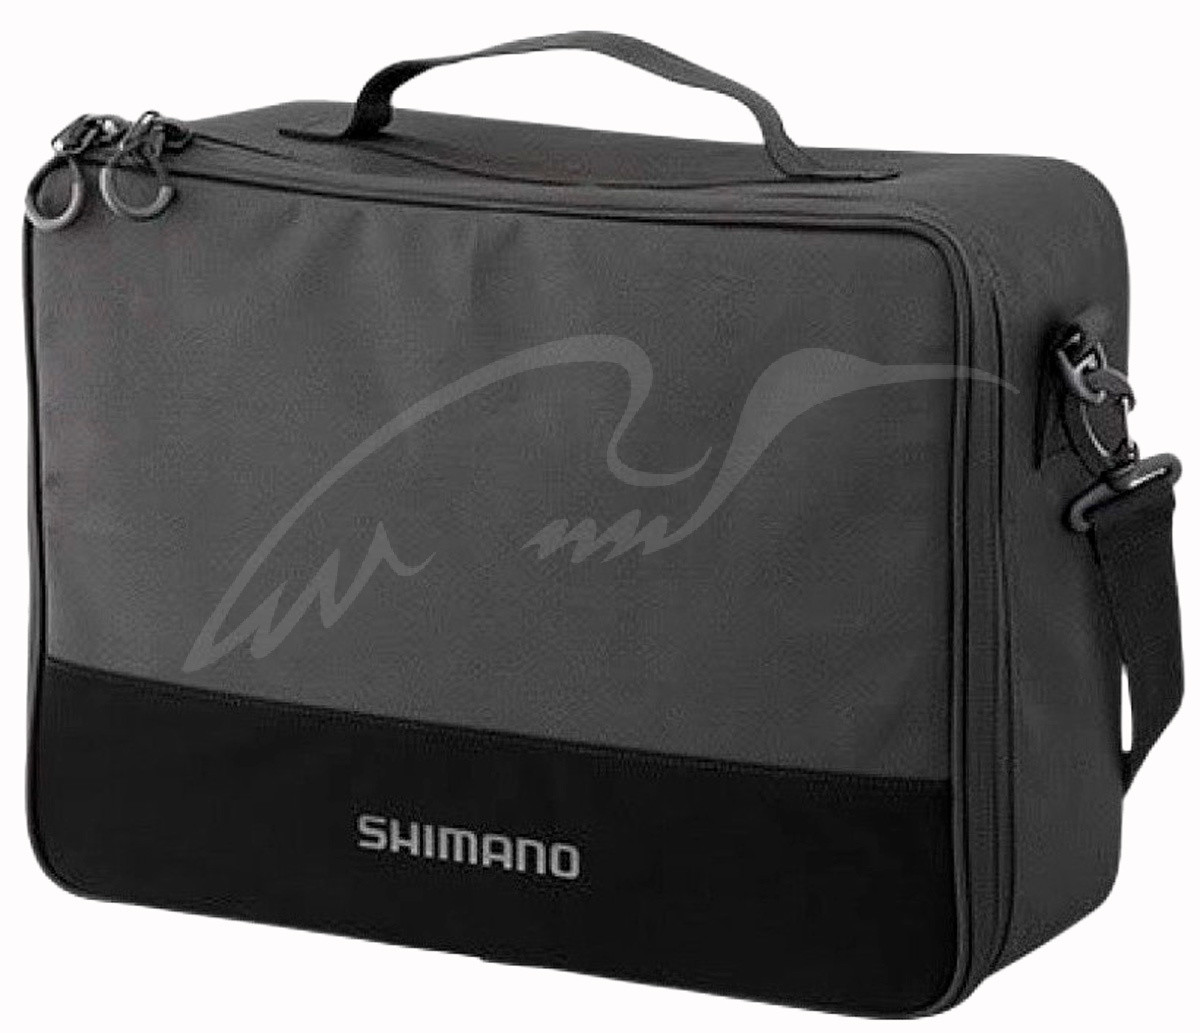 Сумка Shimano Reel Pouch Medium 19x28x13cm (для катушек) ц:черныйСумка Shimano Reel Pouch Medium 19x28x13cm (для катушек) ц:черный